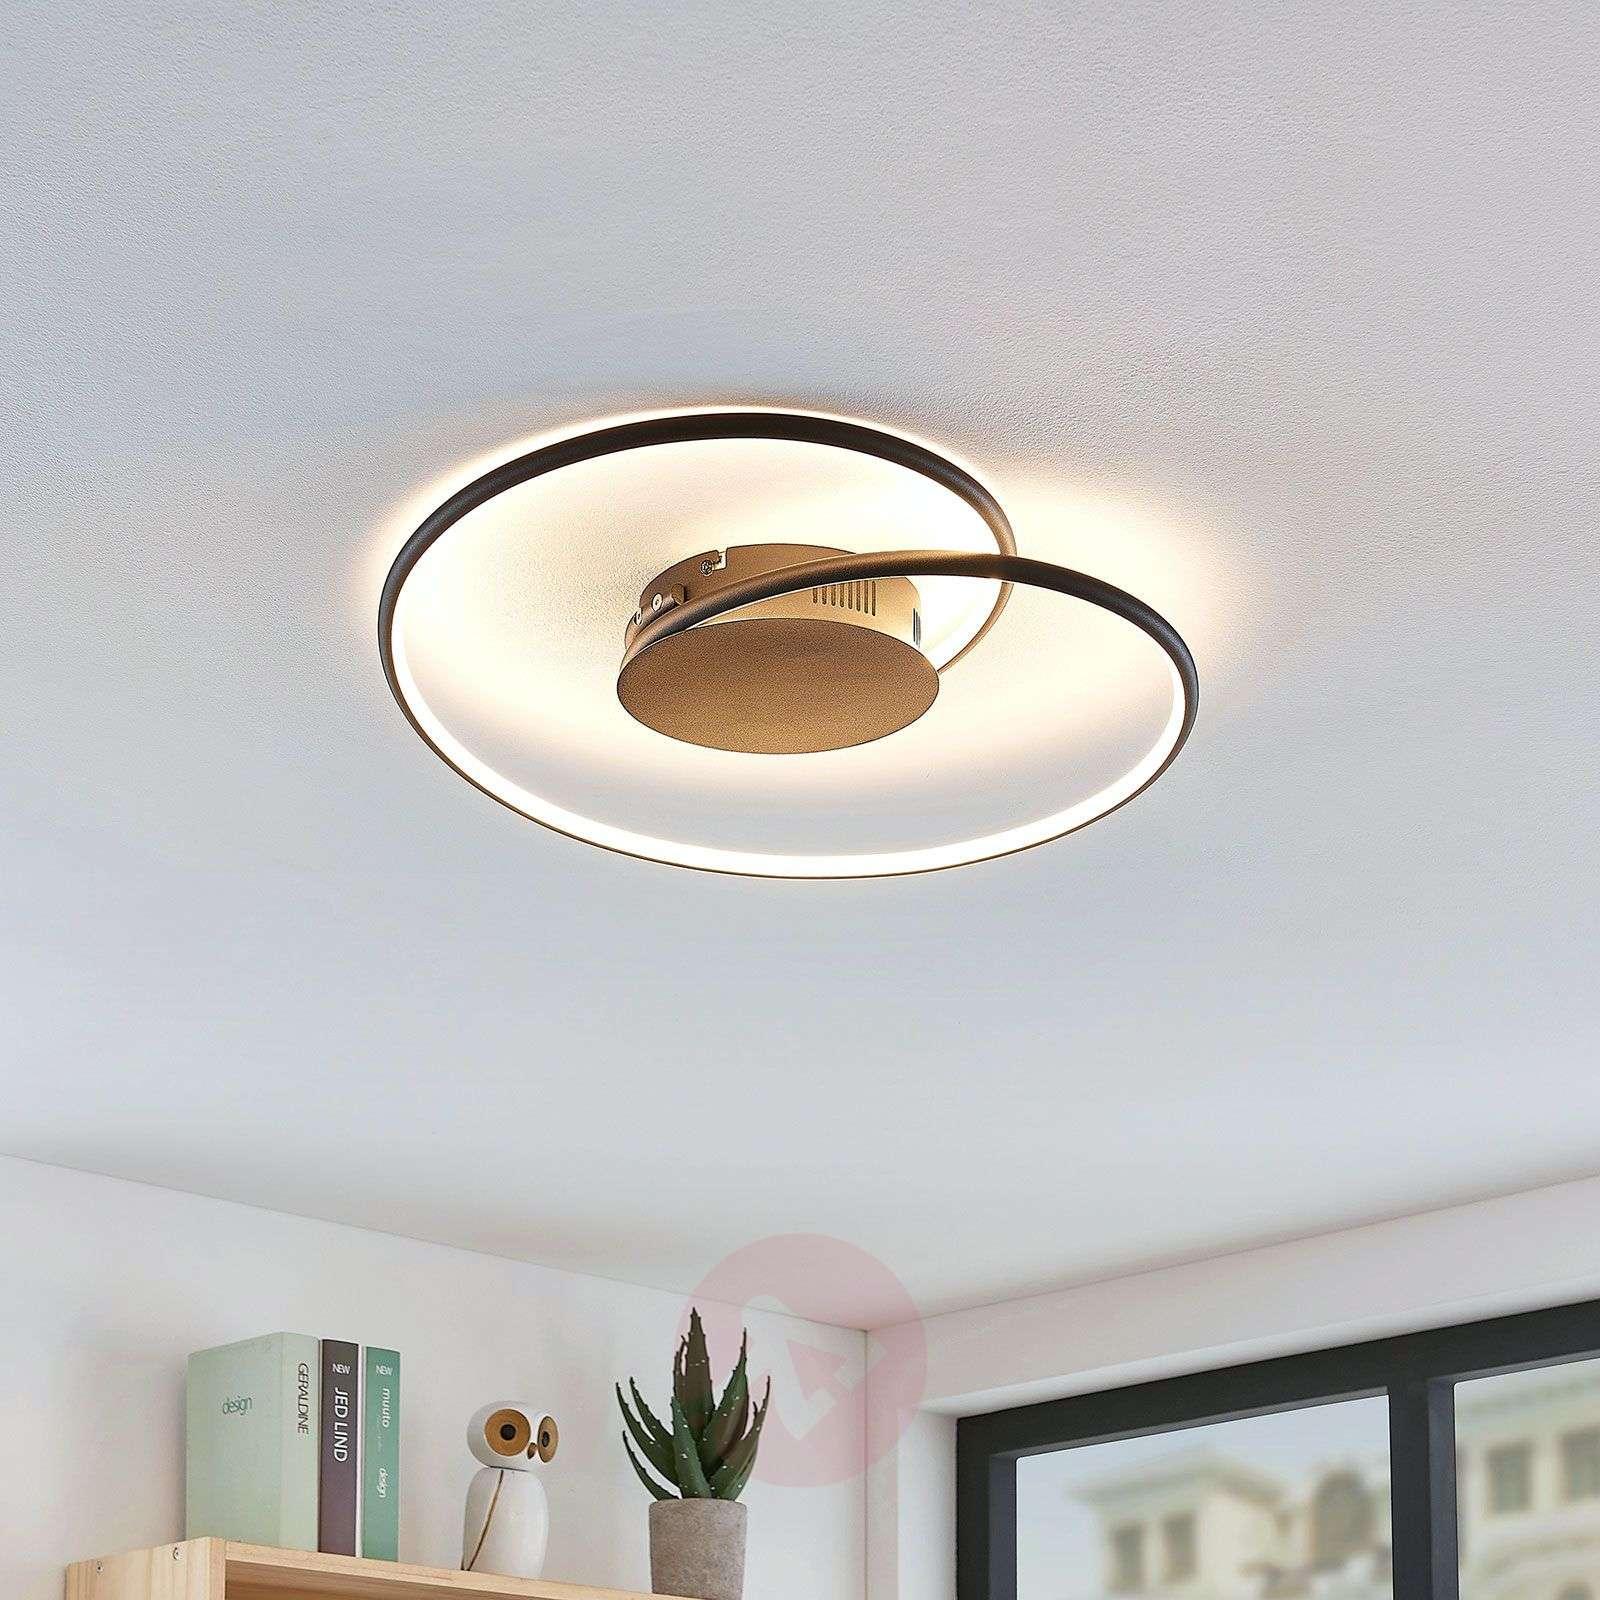 Lindby Joline LED-kattovalaisin, musta, 45 cm-9639130-02